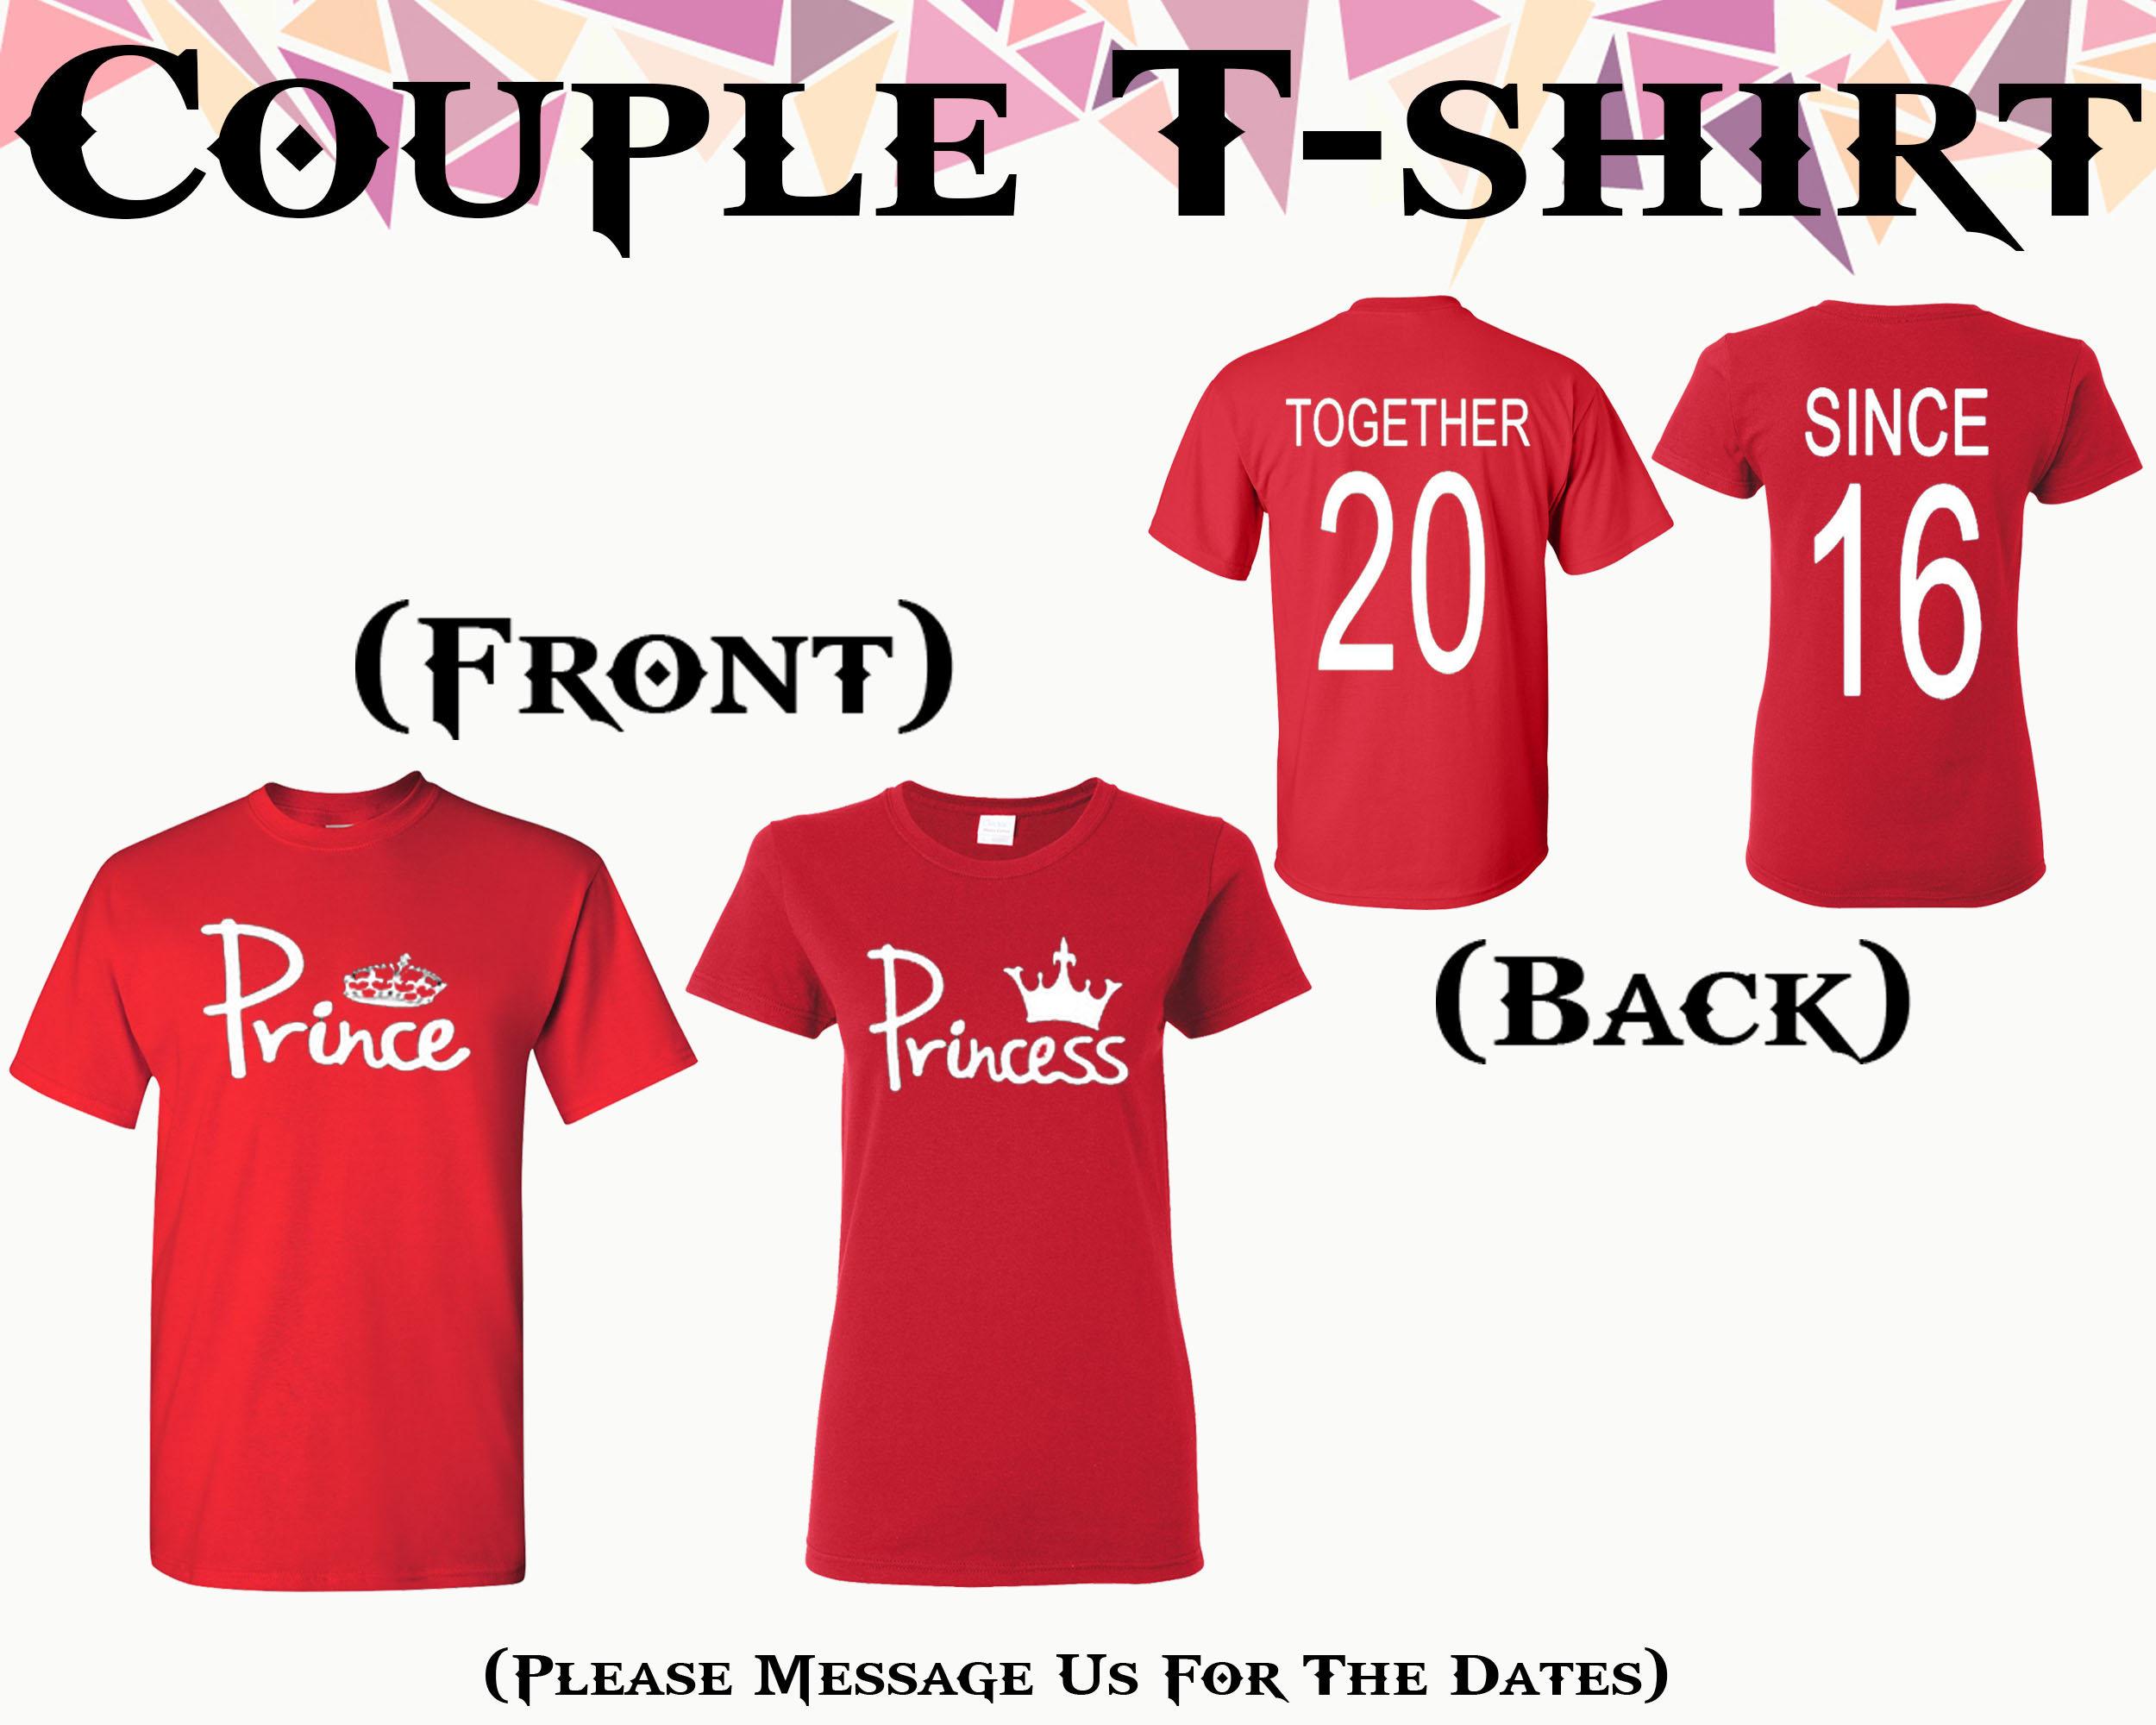 Prince Princess T Shirt Together Since On Back T Shirt Front Back